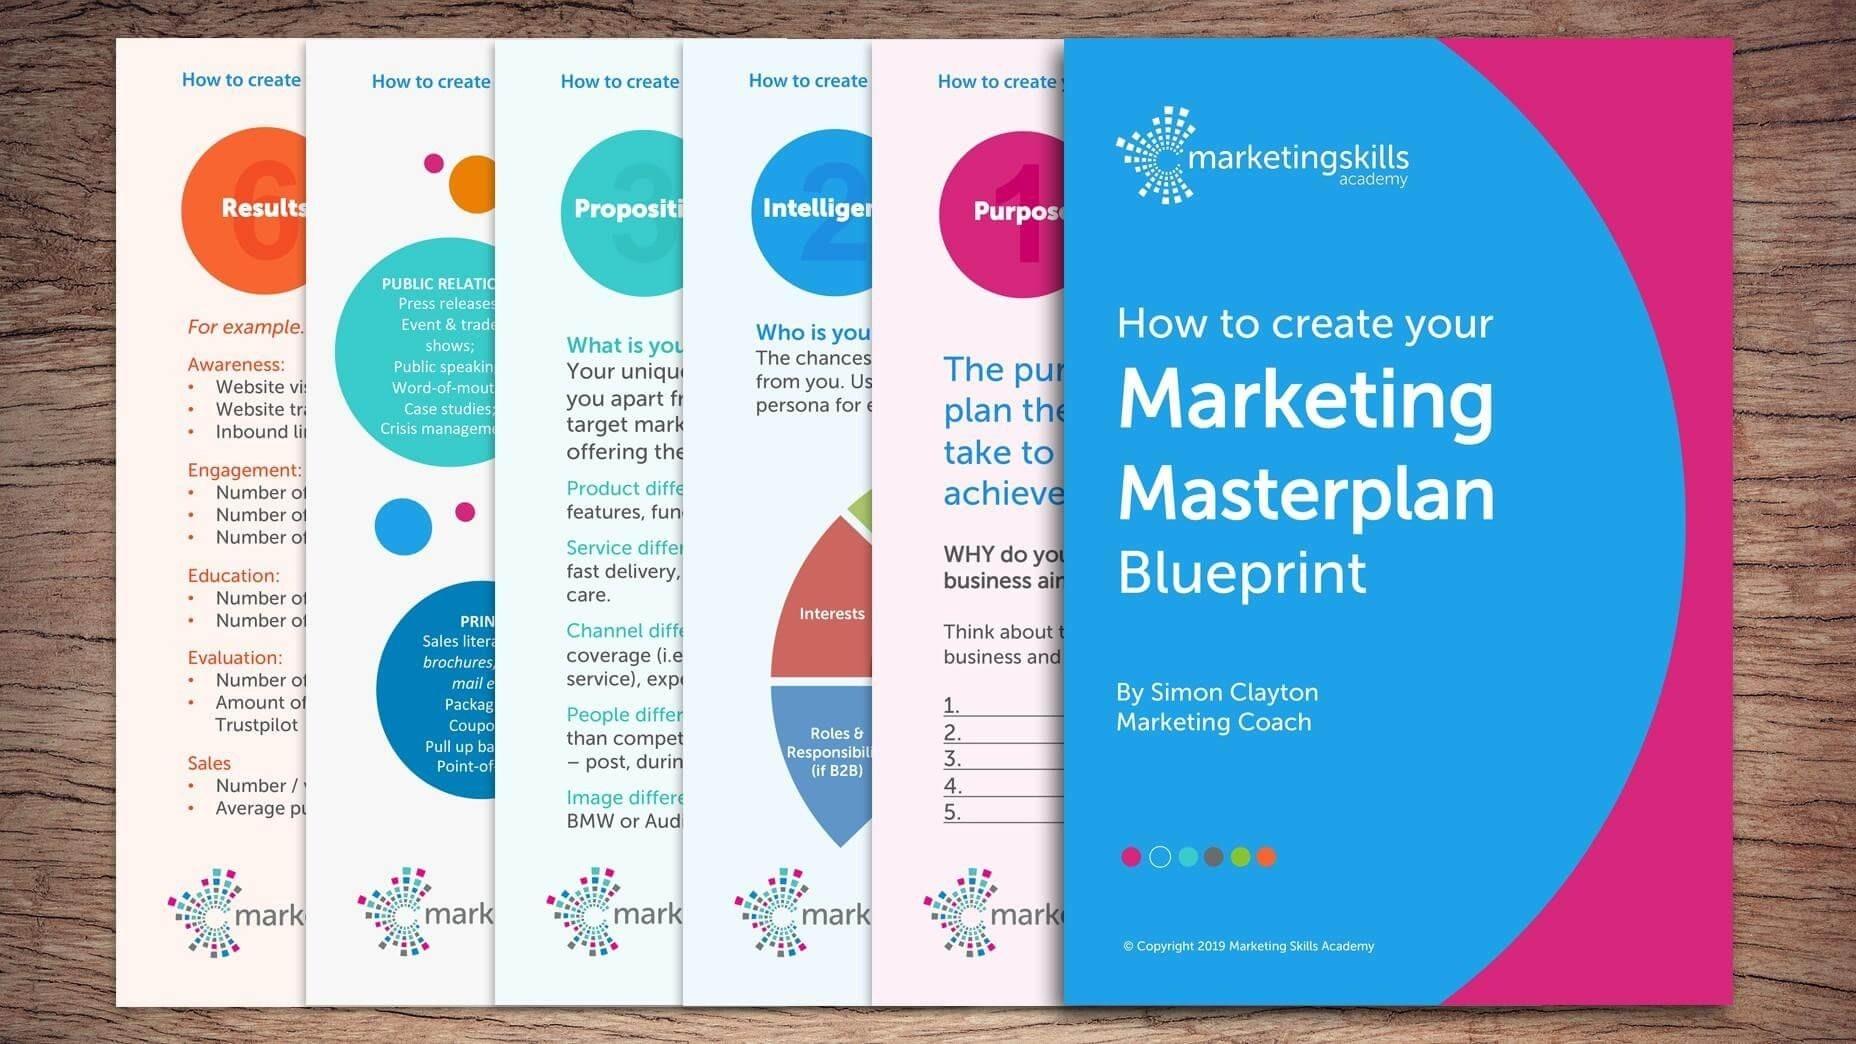 Marketing Masterplan Blueprint Mockup